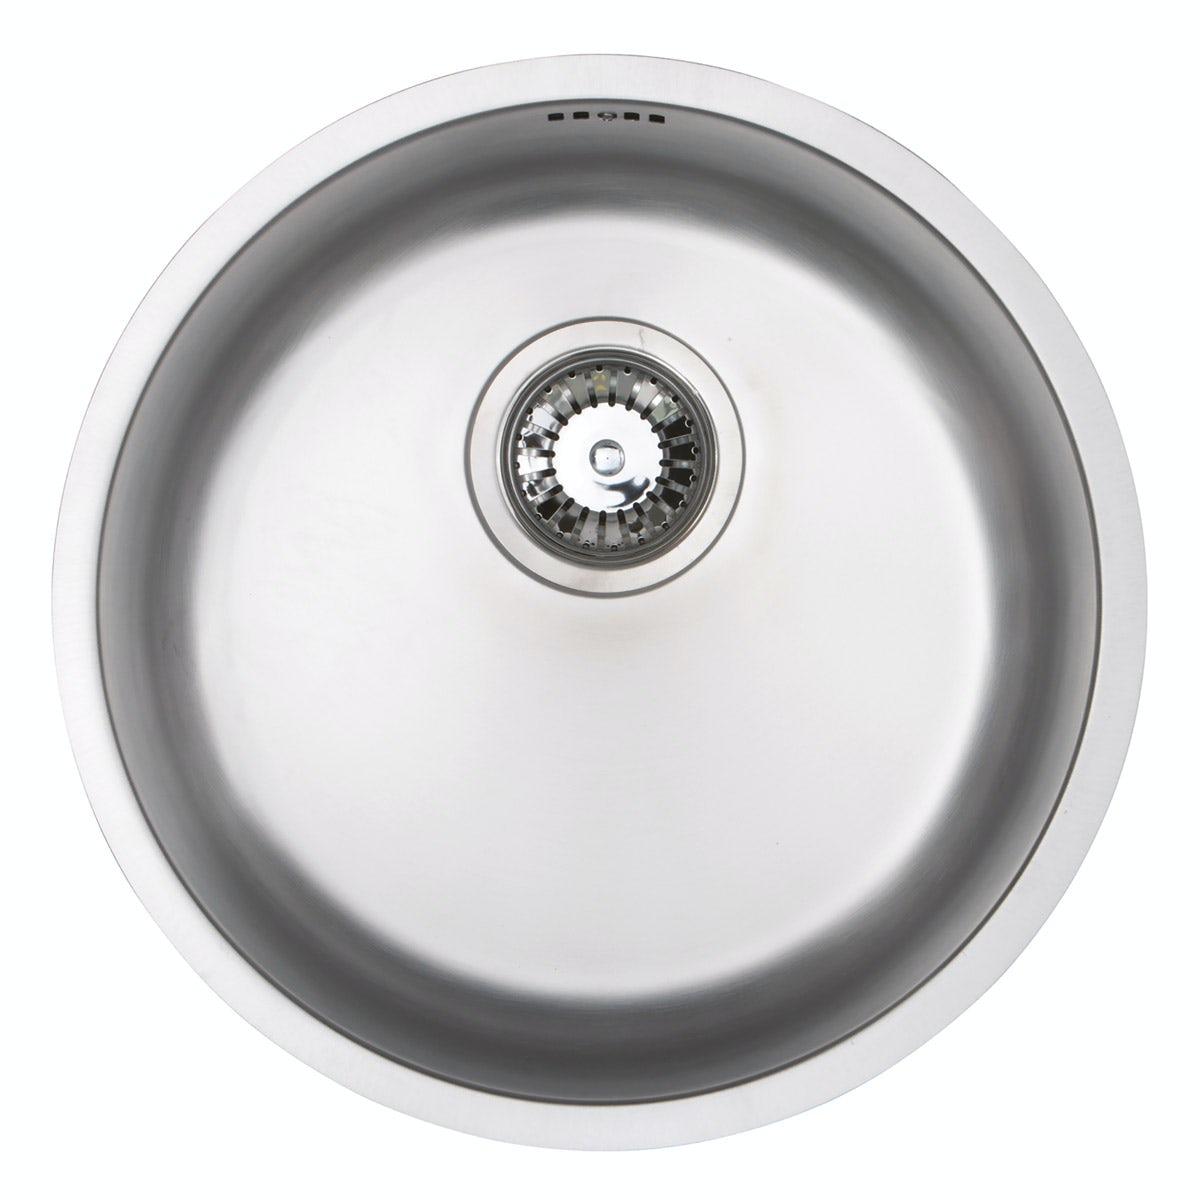 schon rydal classic round undermount single bowl stainless steel kitchen sink with waste 390 x 390